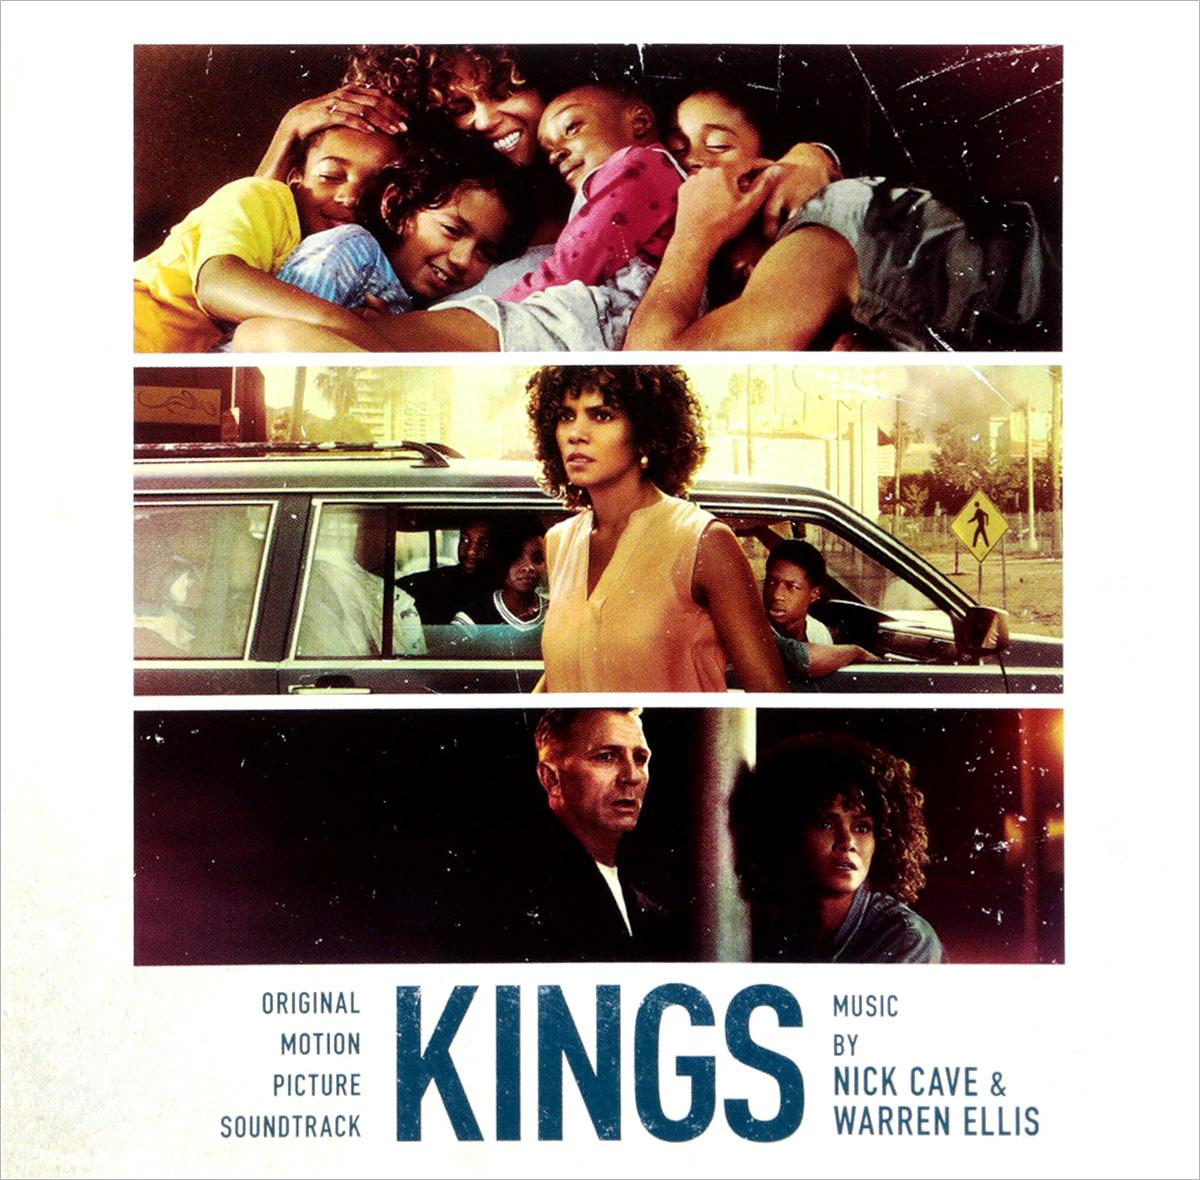 Nick Cave & Warren Ellis - Kings виниловая пластинка nick cave ellis warren kings ost